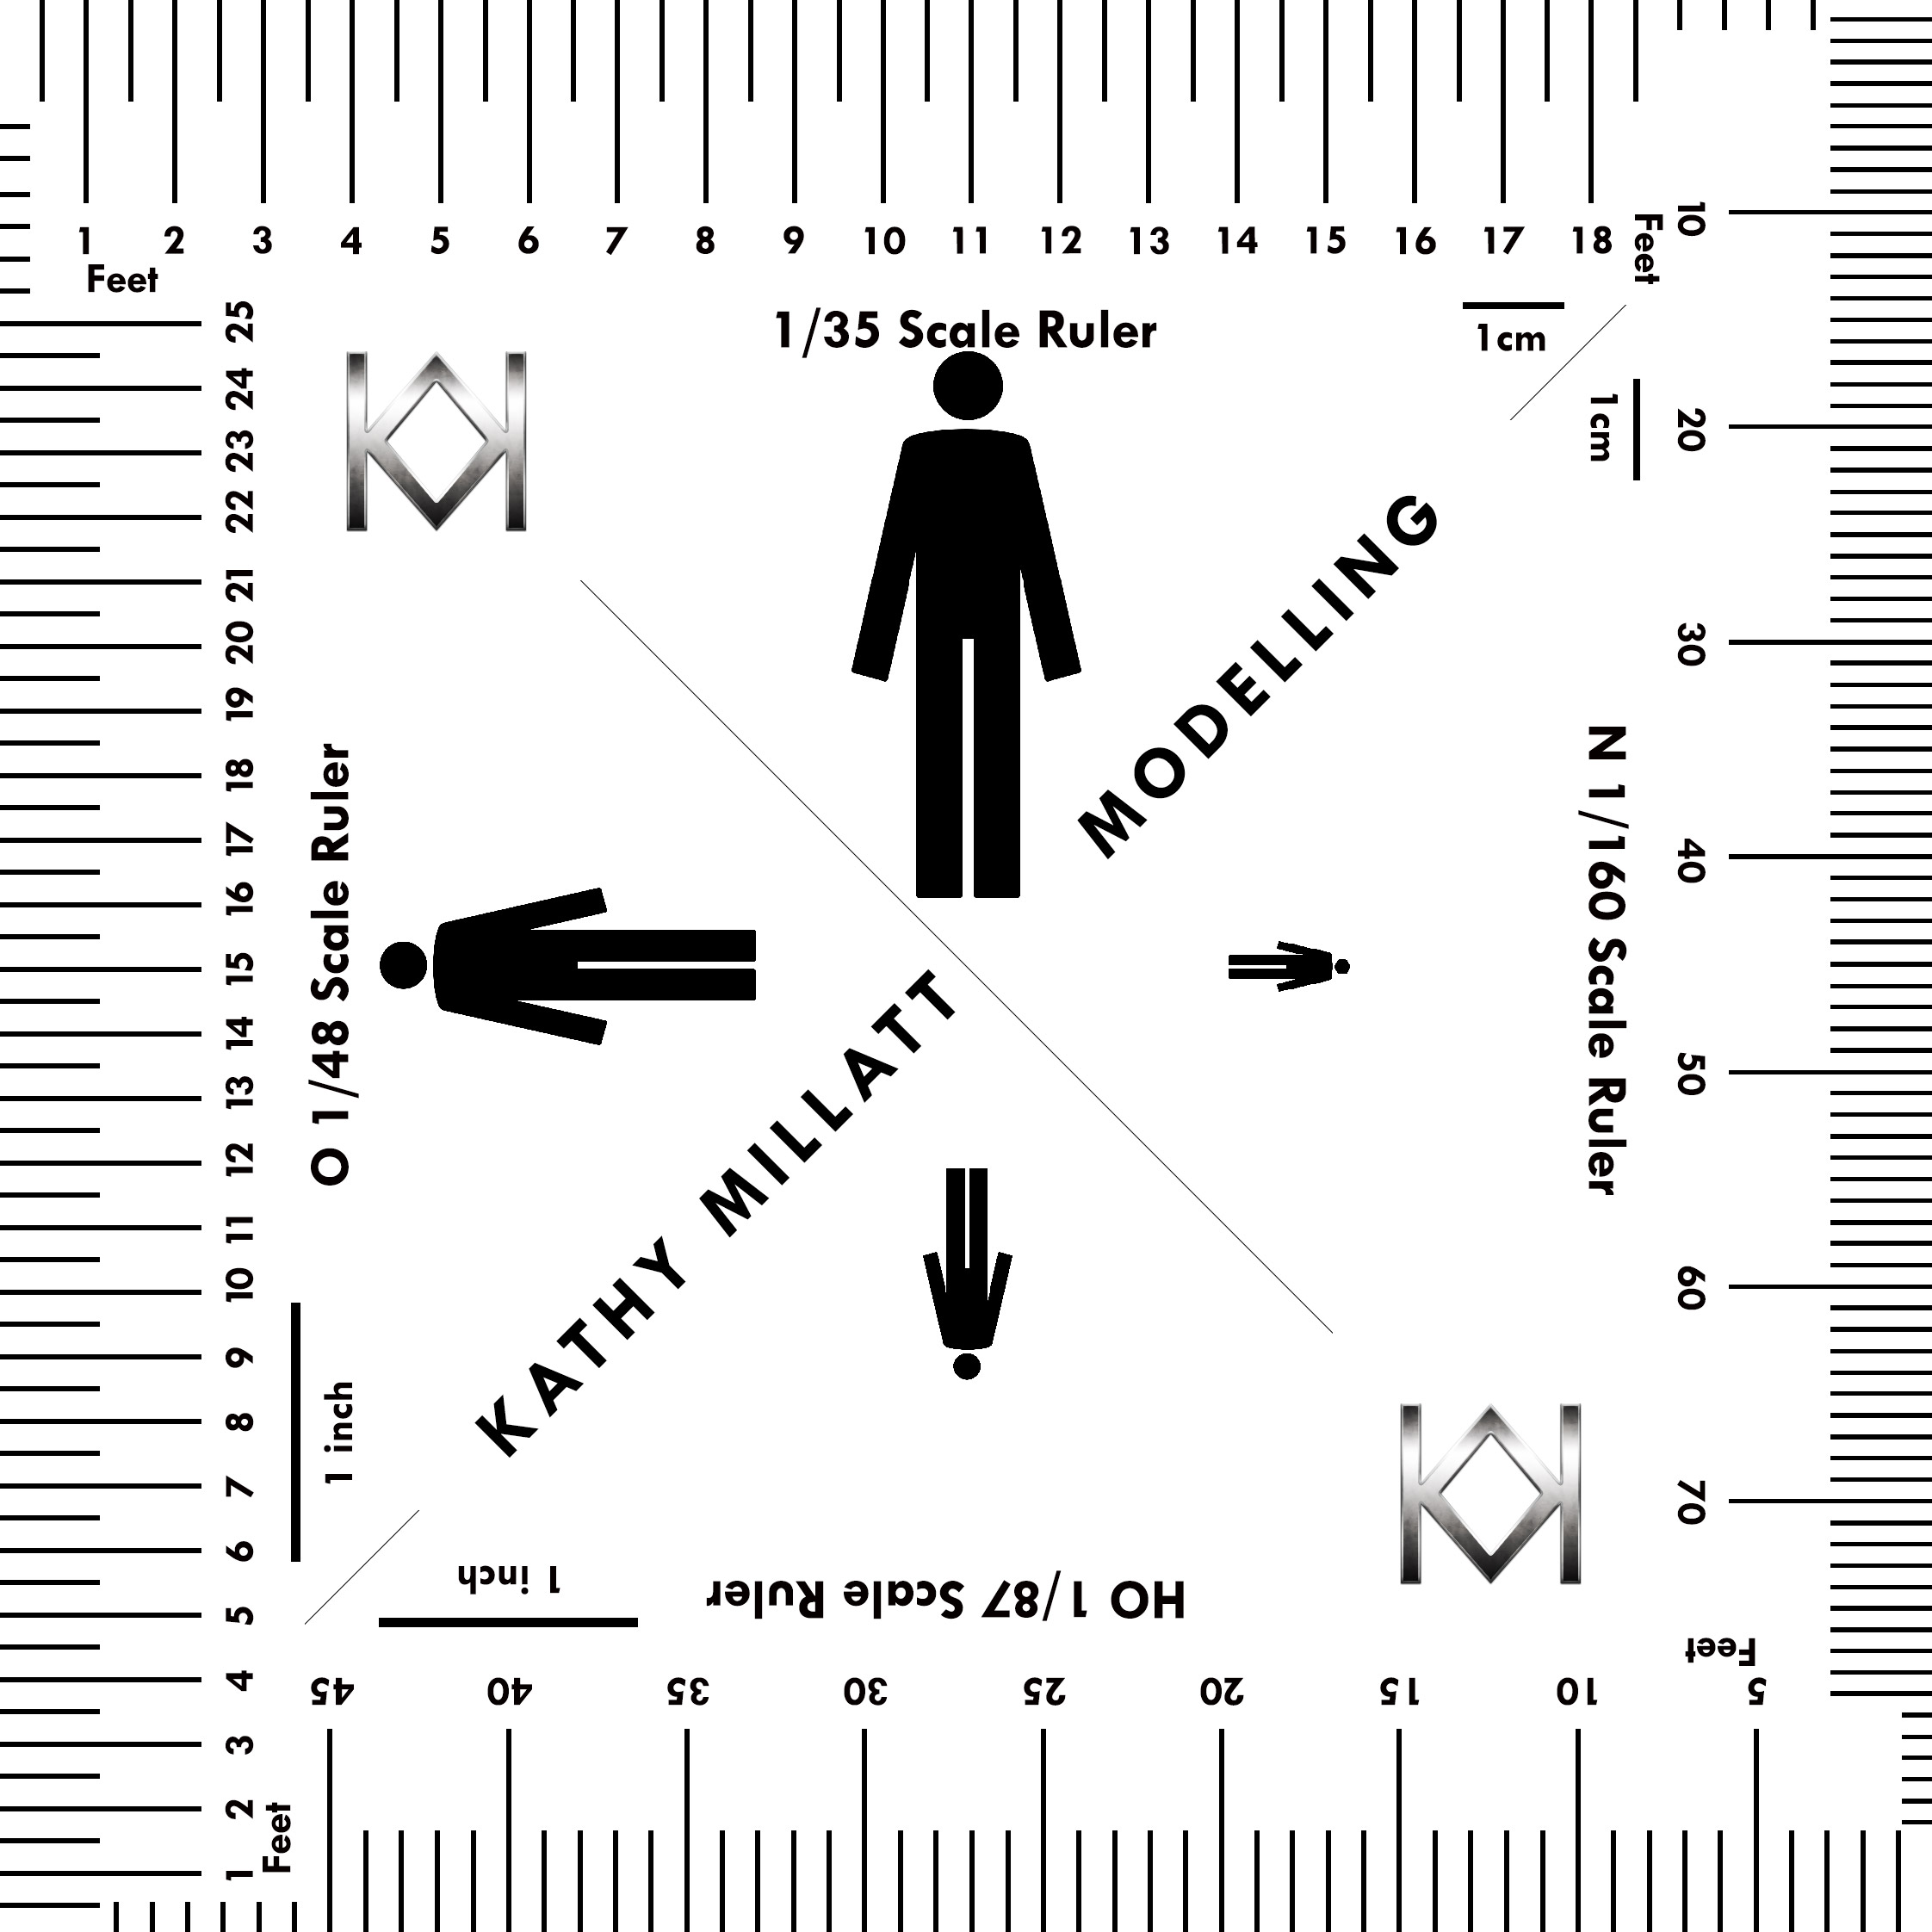 Modelling Water: Scale Ruler - man